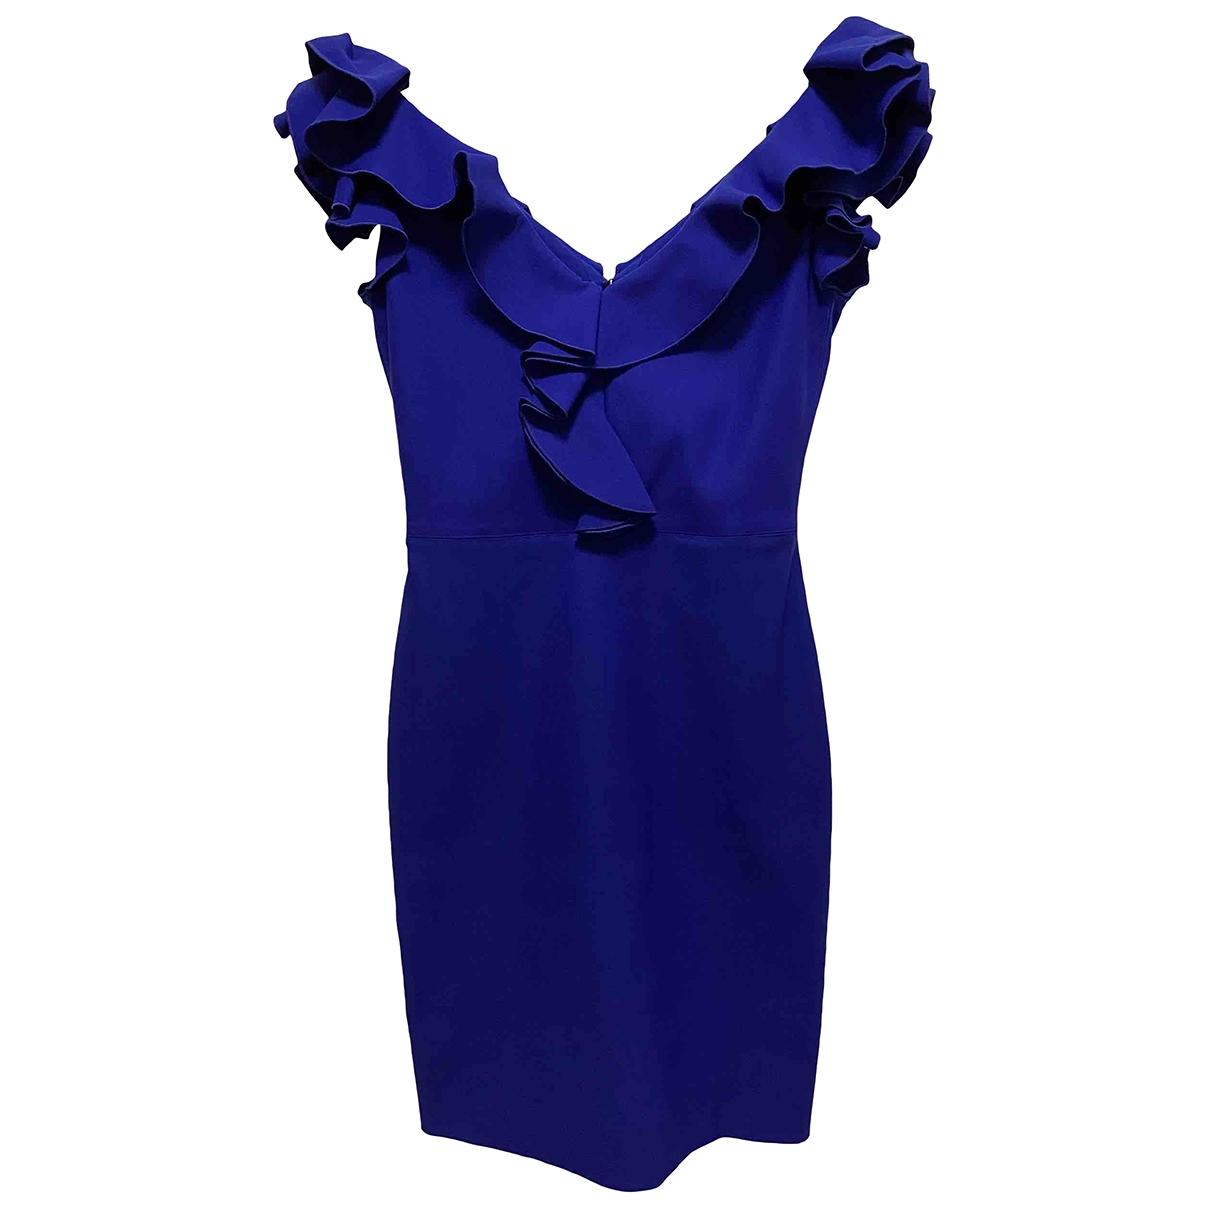 Lanvin \N Blue dress for Women 36 FR